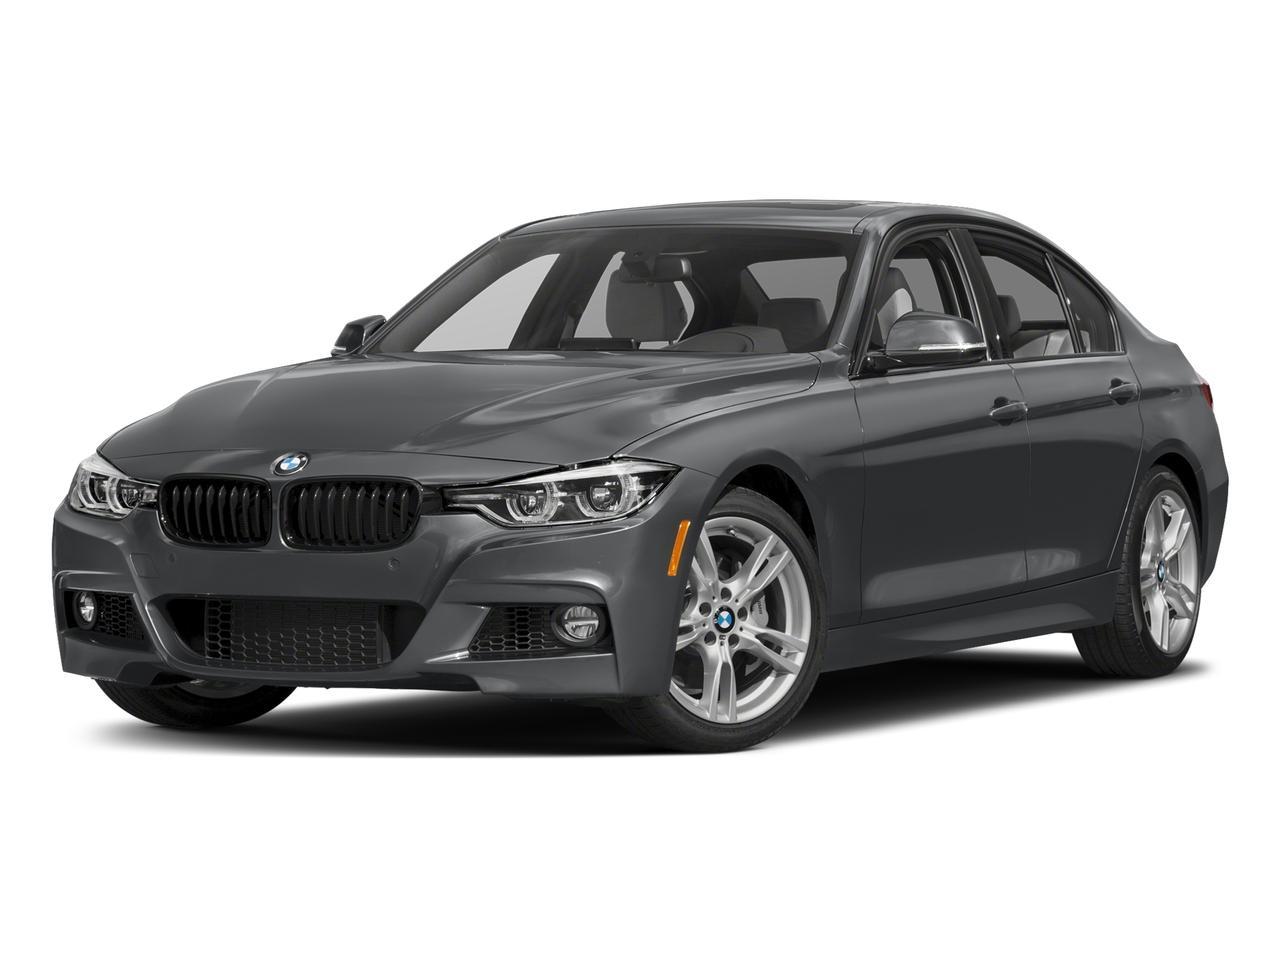 2018 BMW 340i Vehicle Photo in Pleasanton, CA 94588